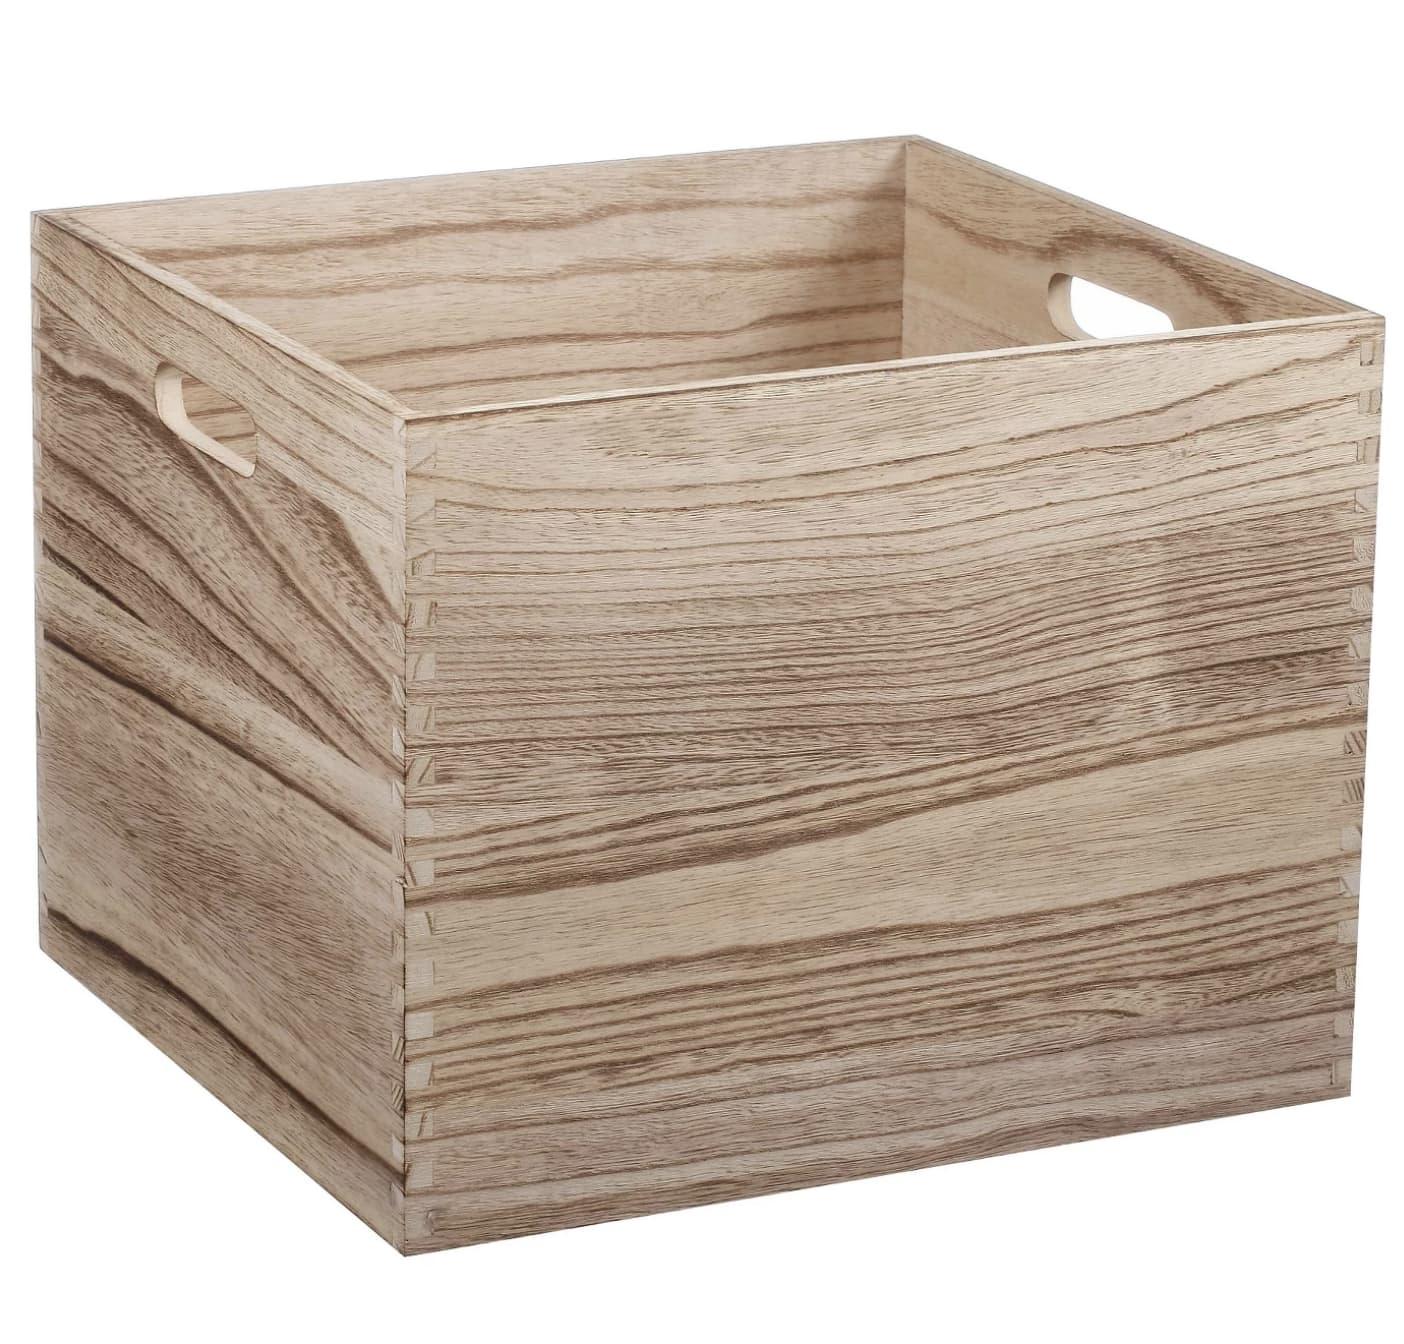 Where To Buy Storage Cubes For An Ikea Kallax Bookshelf